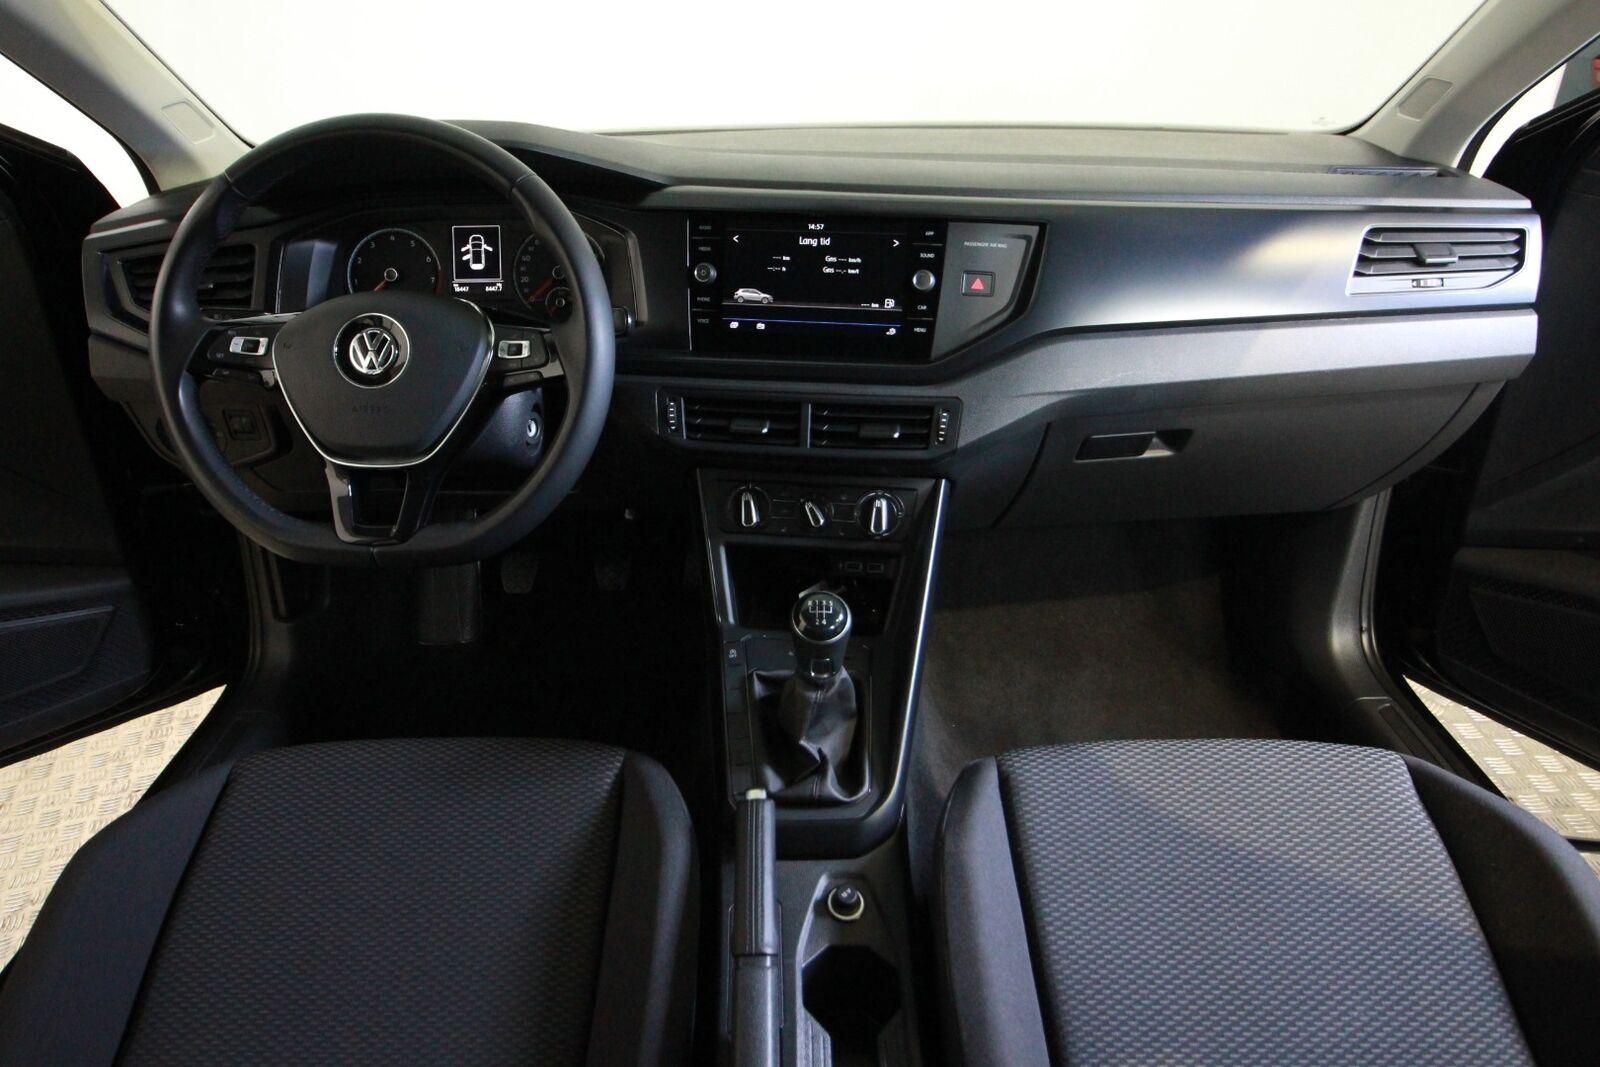 VW Polo MPi 80 Trendline